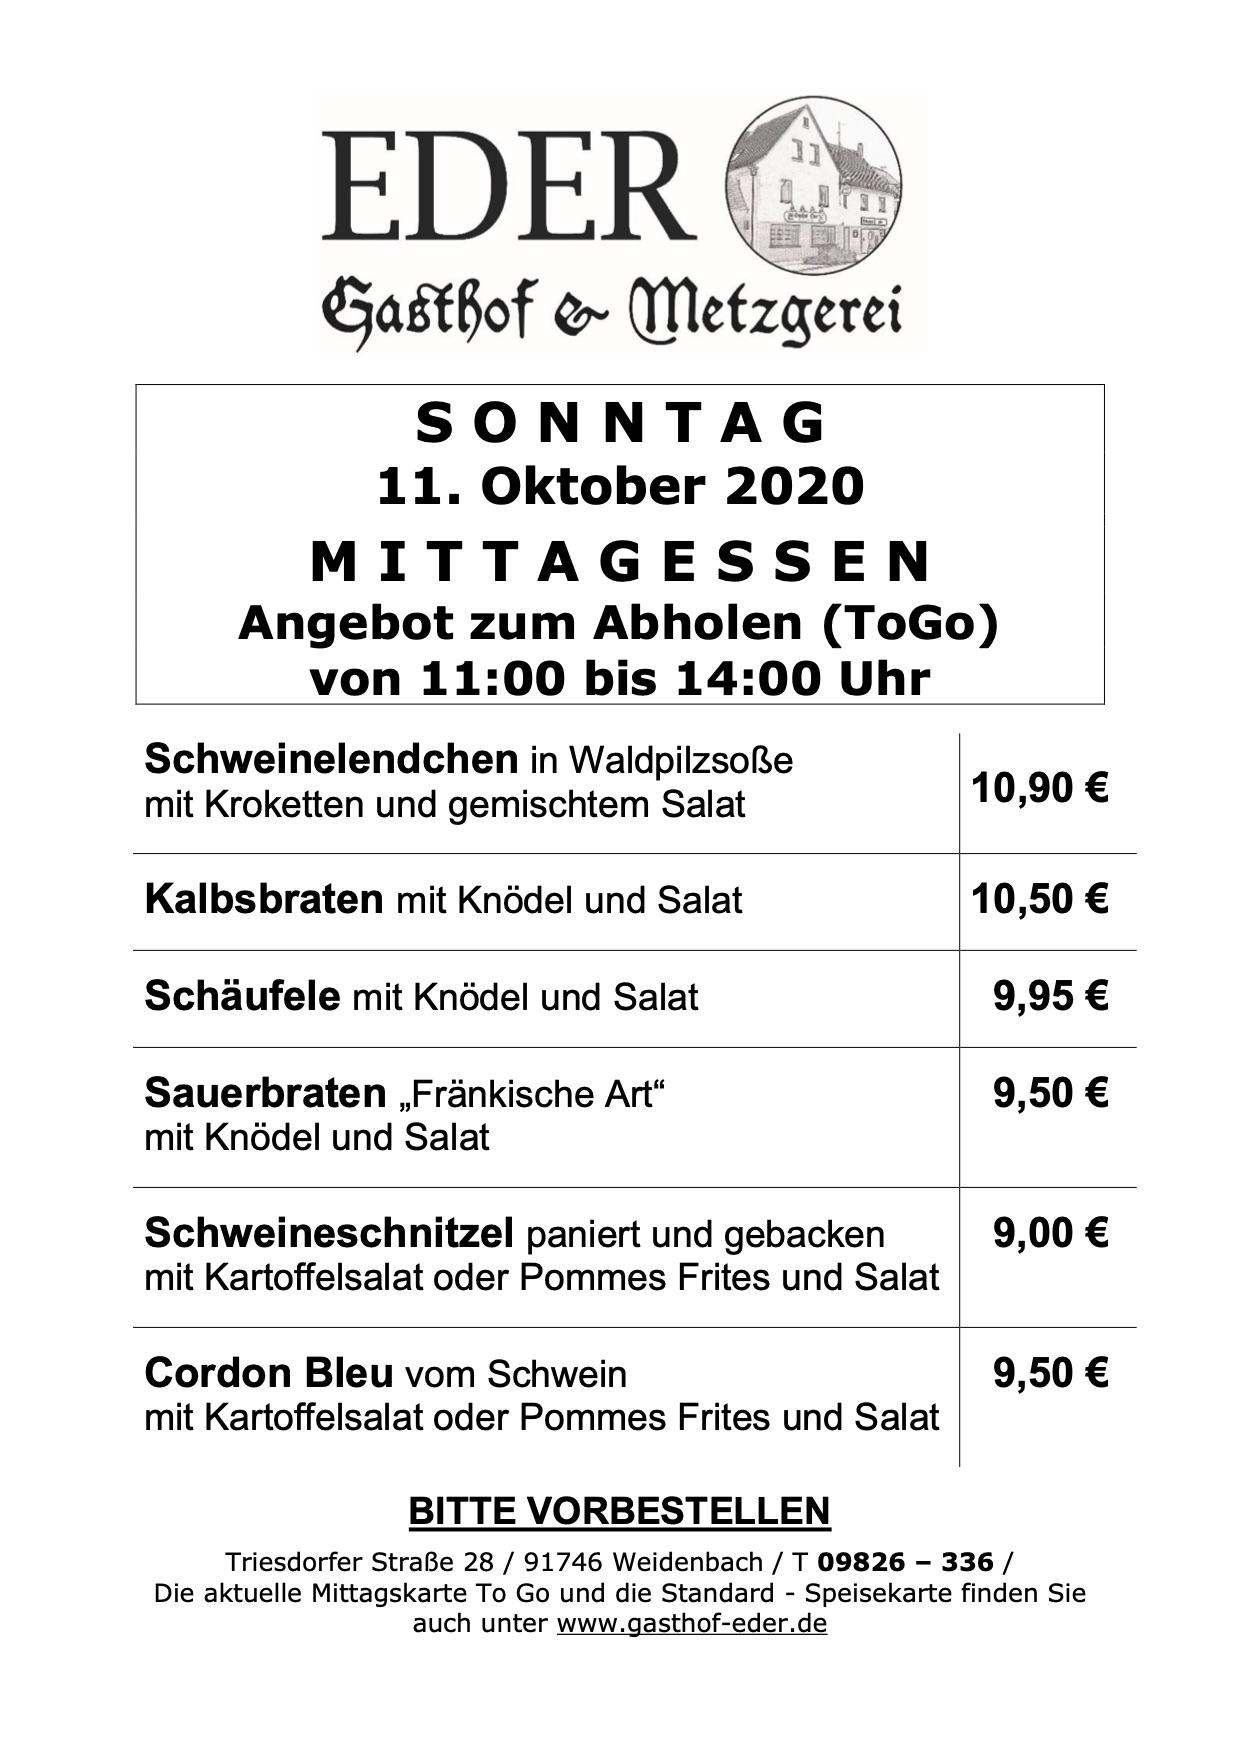 Sonntag_11.10.2020